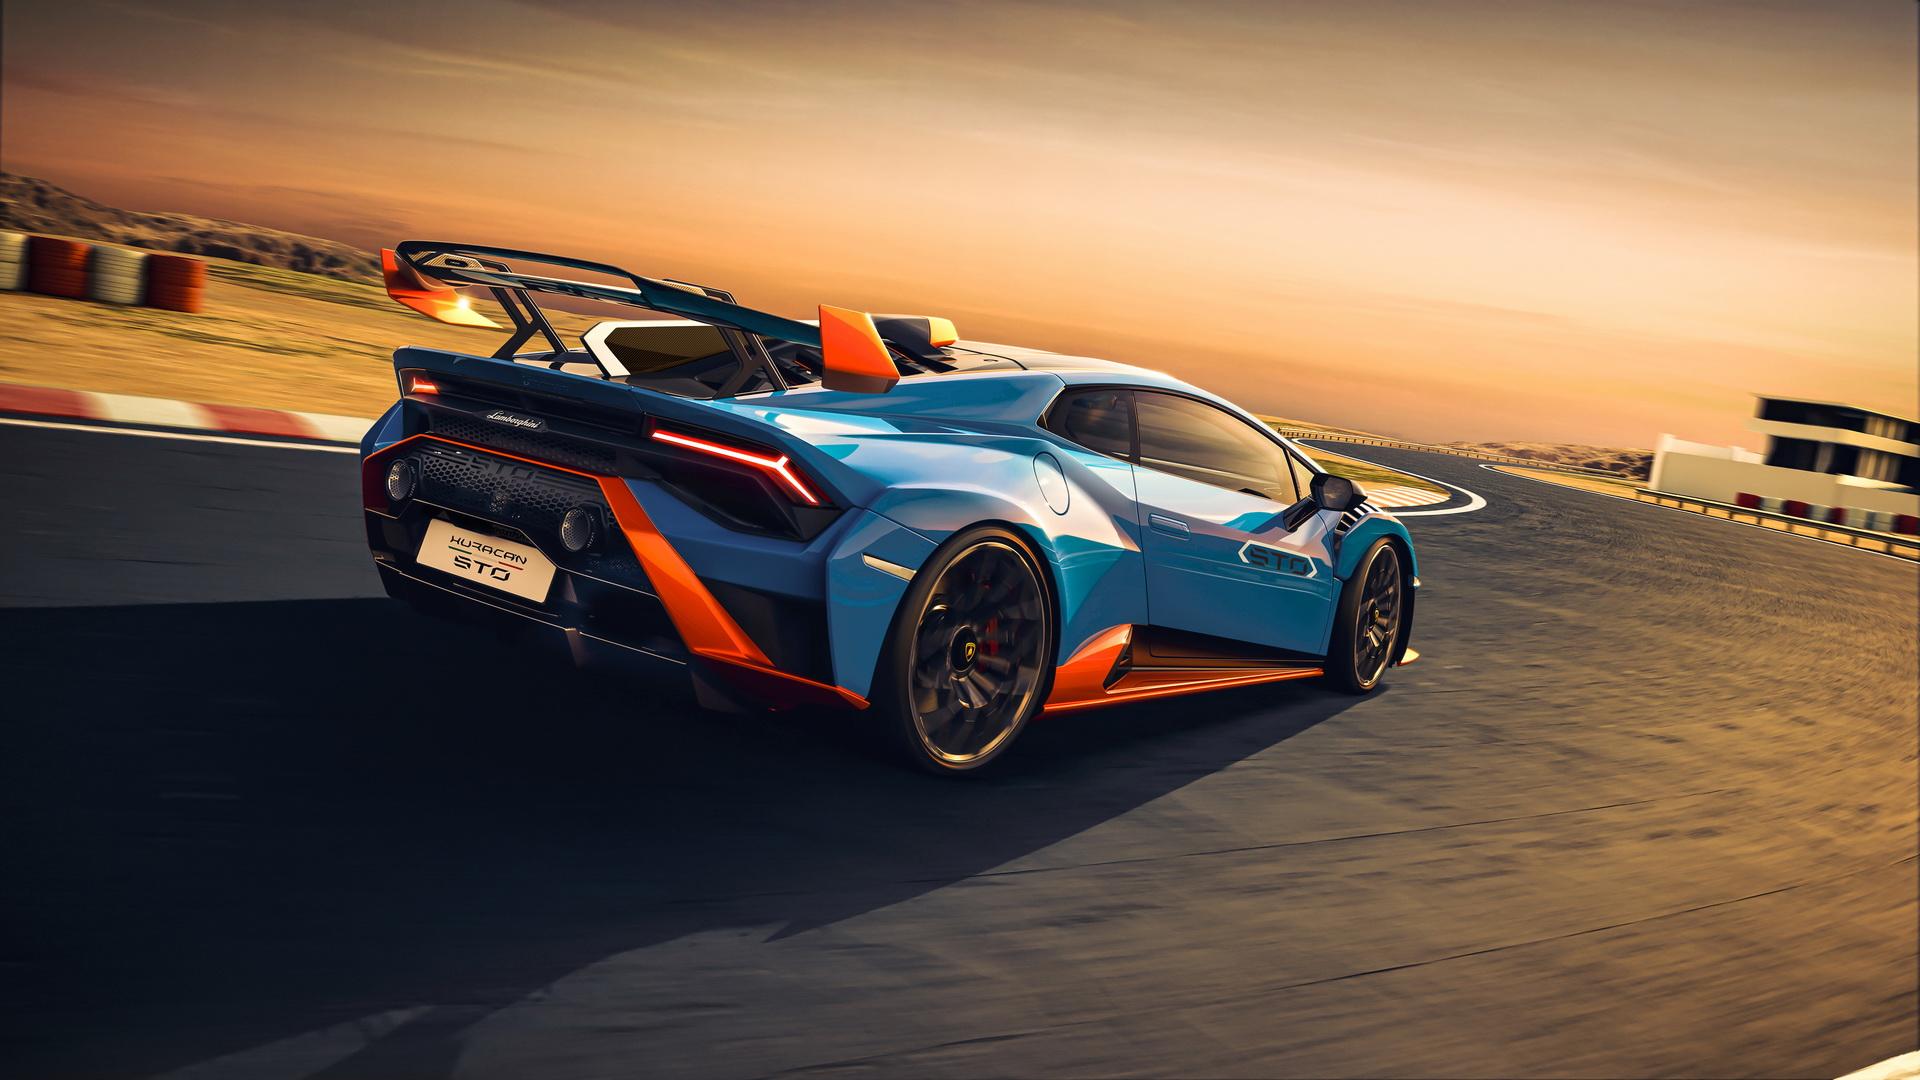 Фото и подробности самого экстремального суперкарка Lamborghini